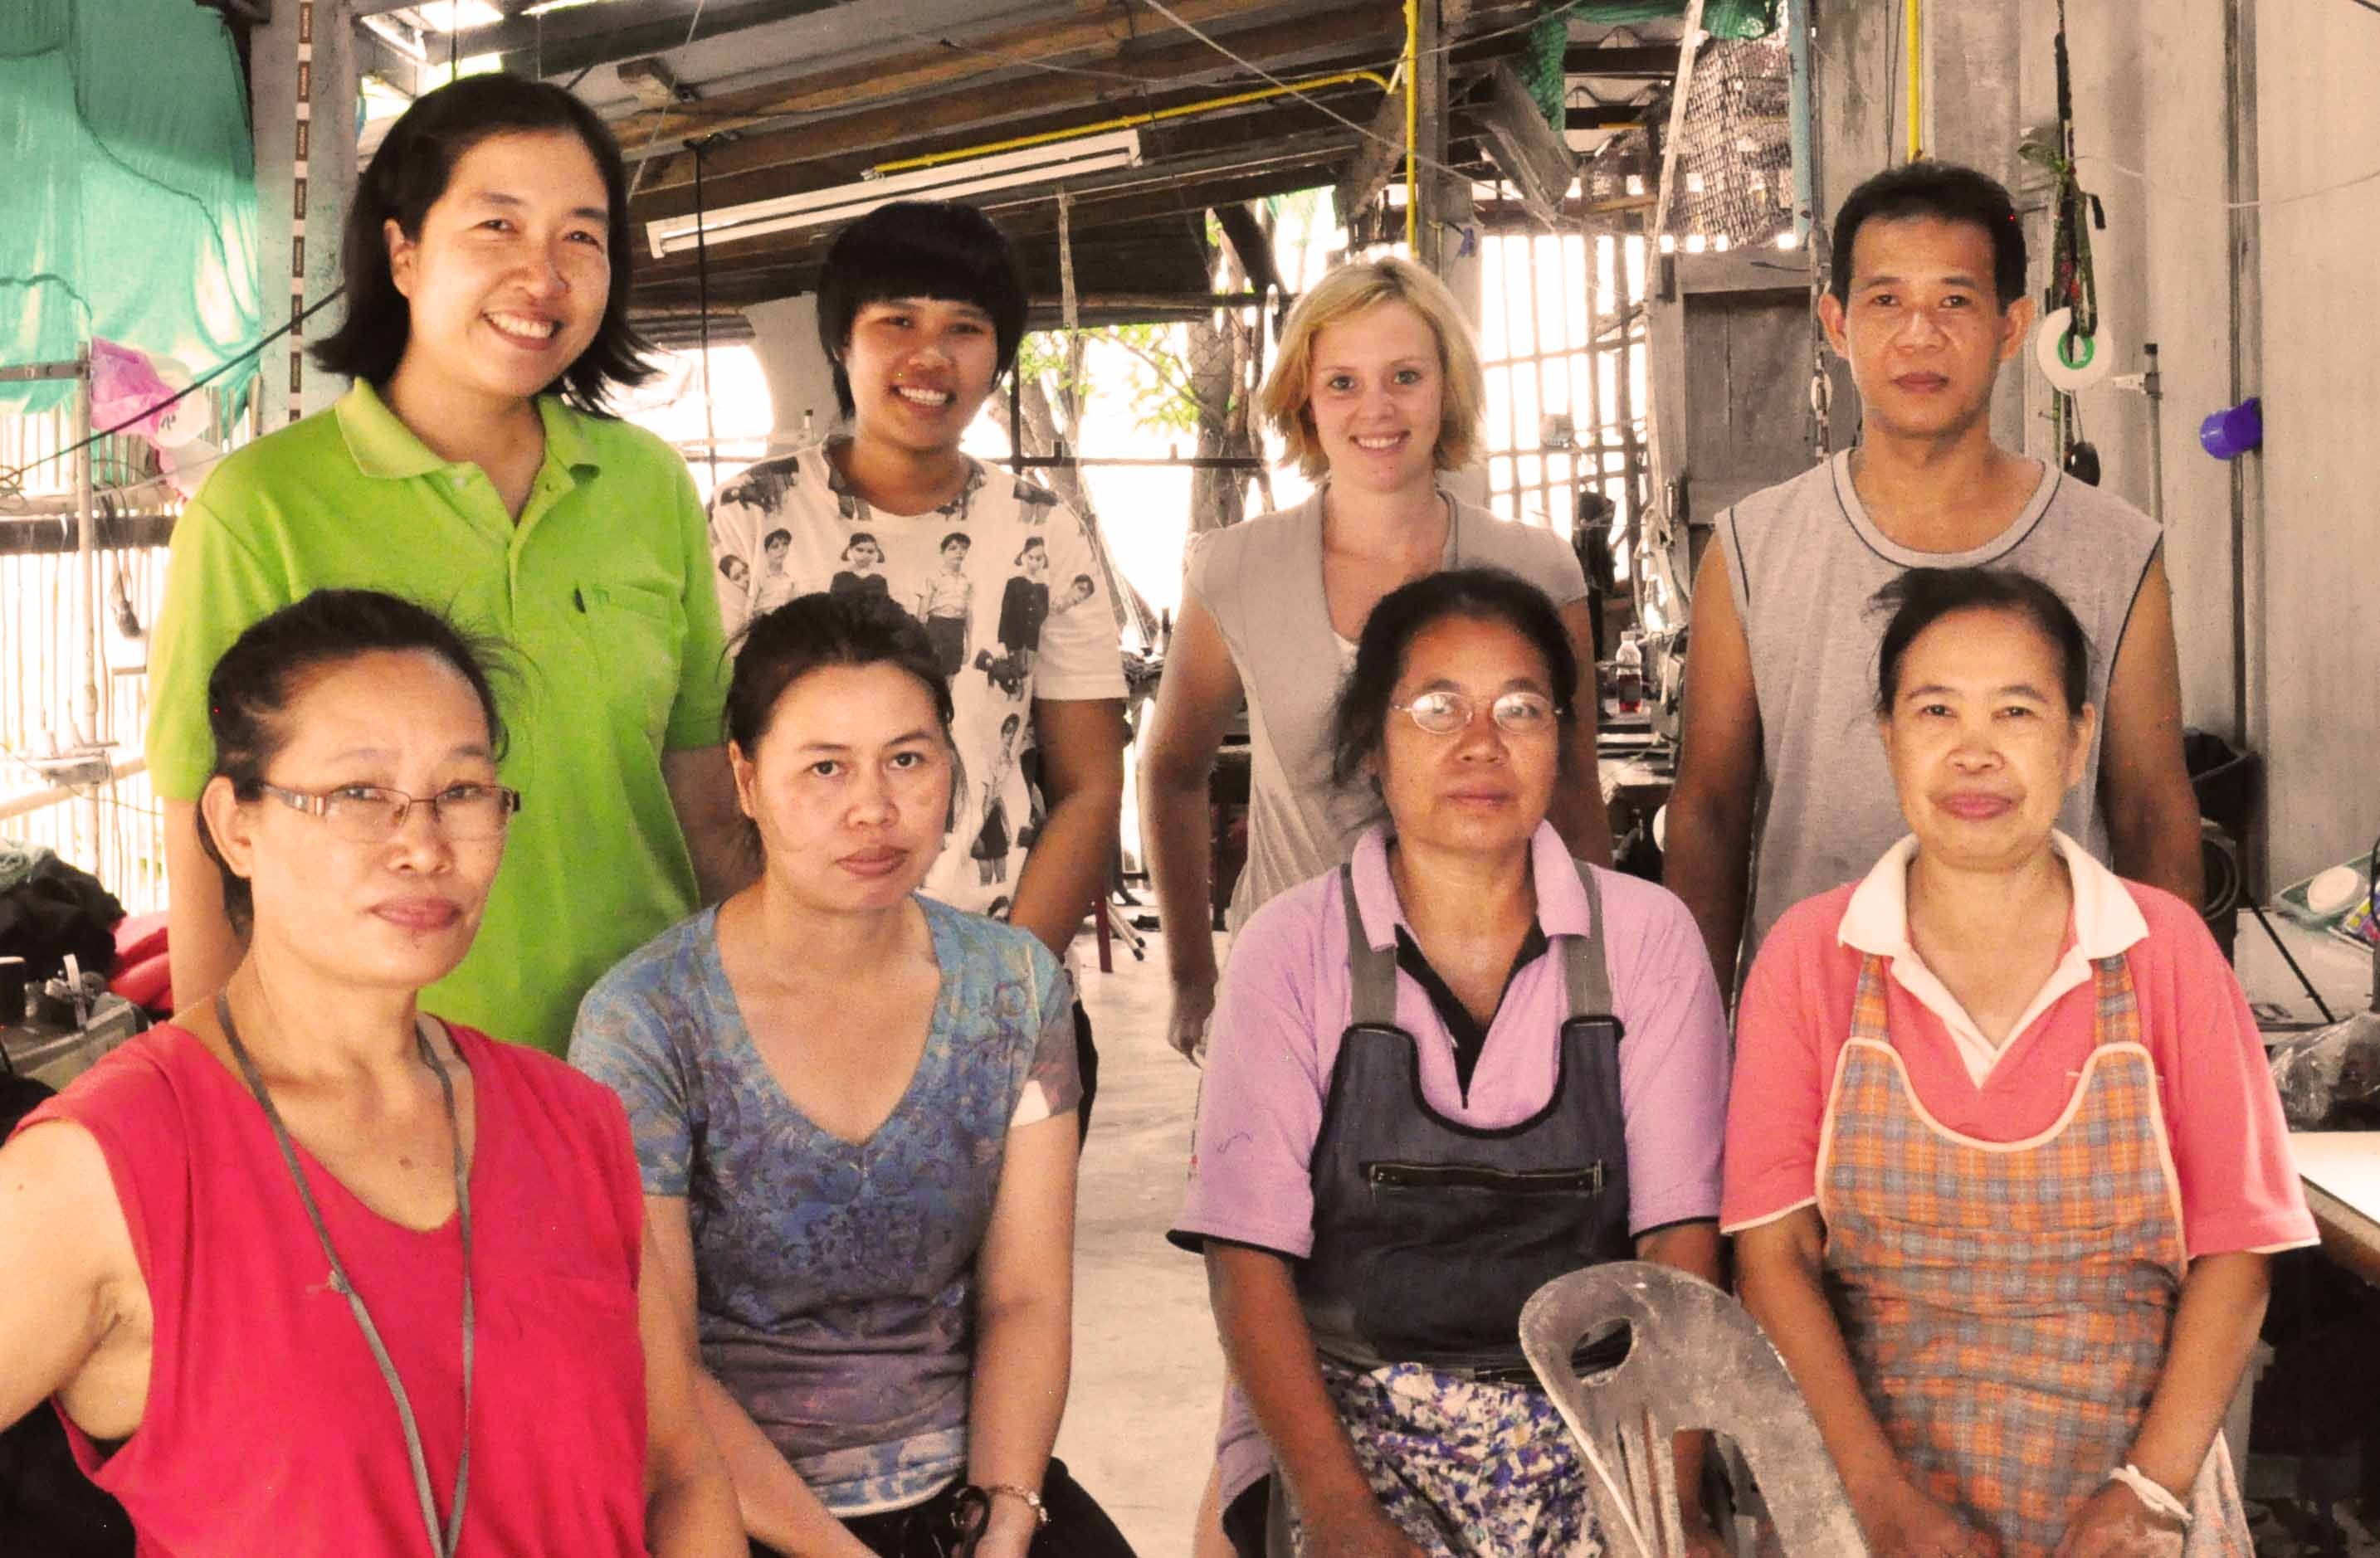 fertigung haremshosen thailand